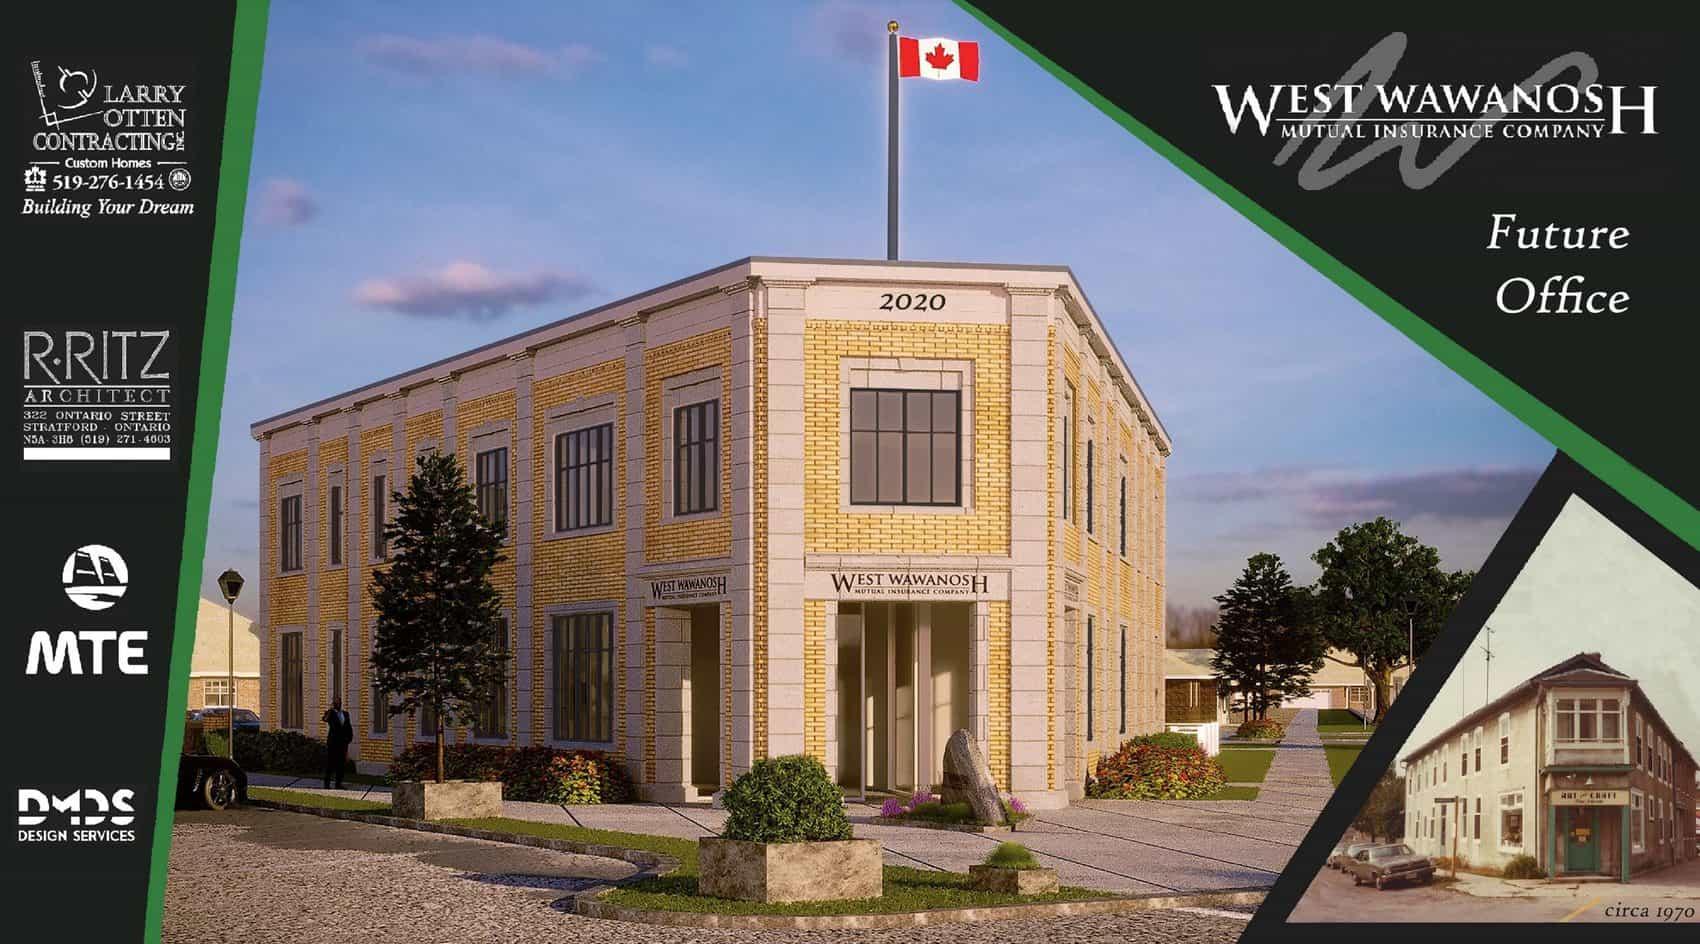 West Wawanosh Office in Goderich Ontario